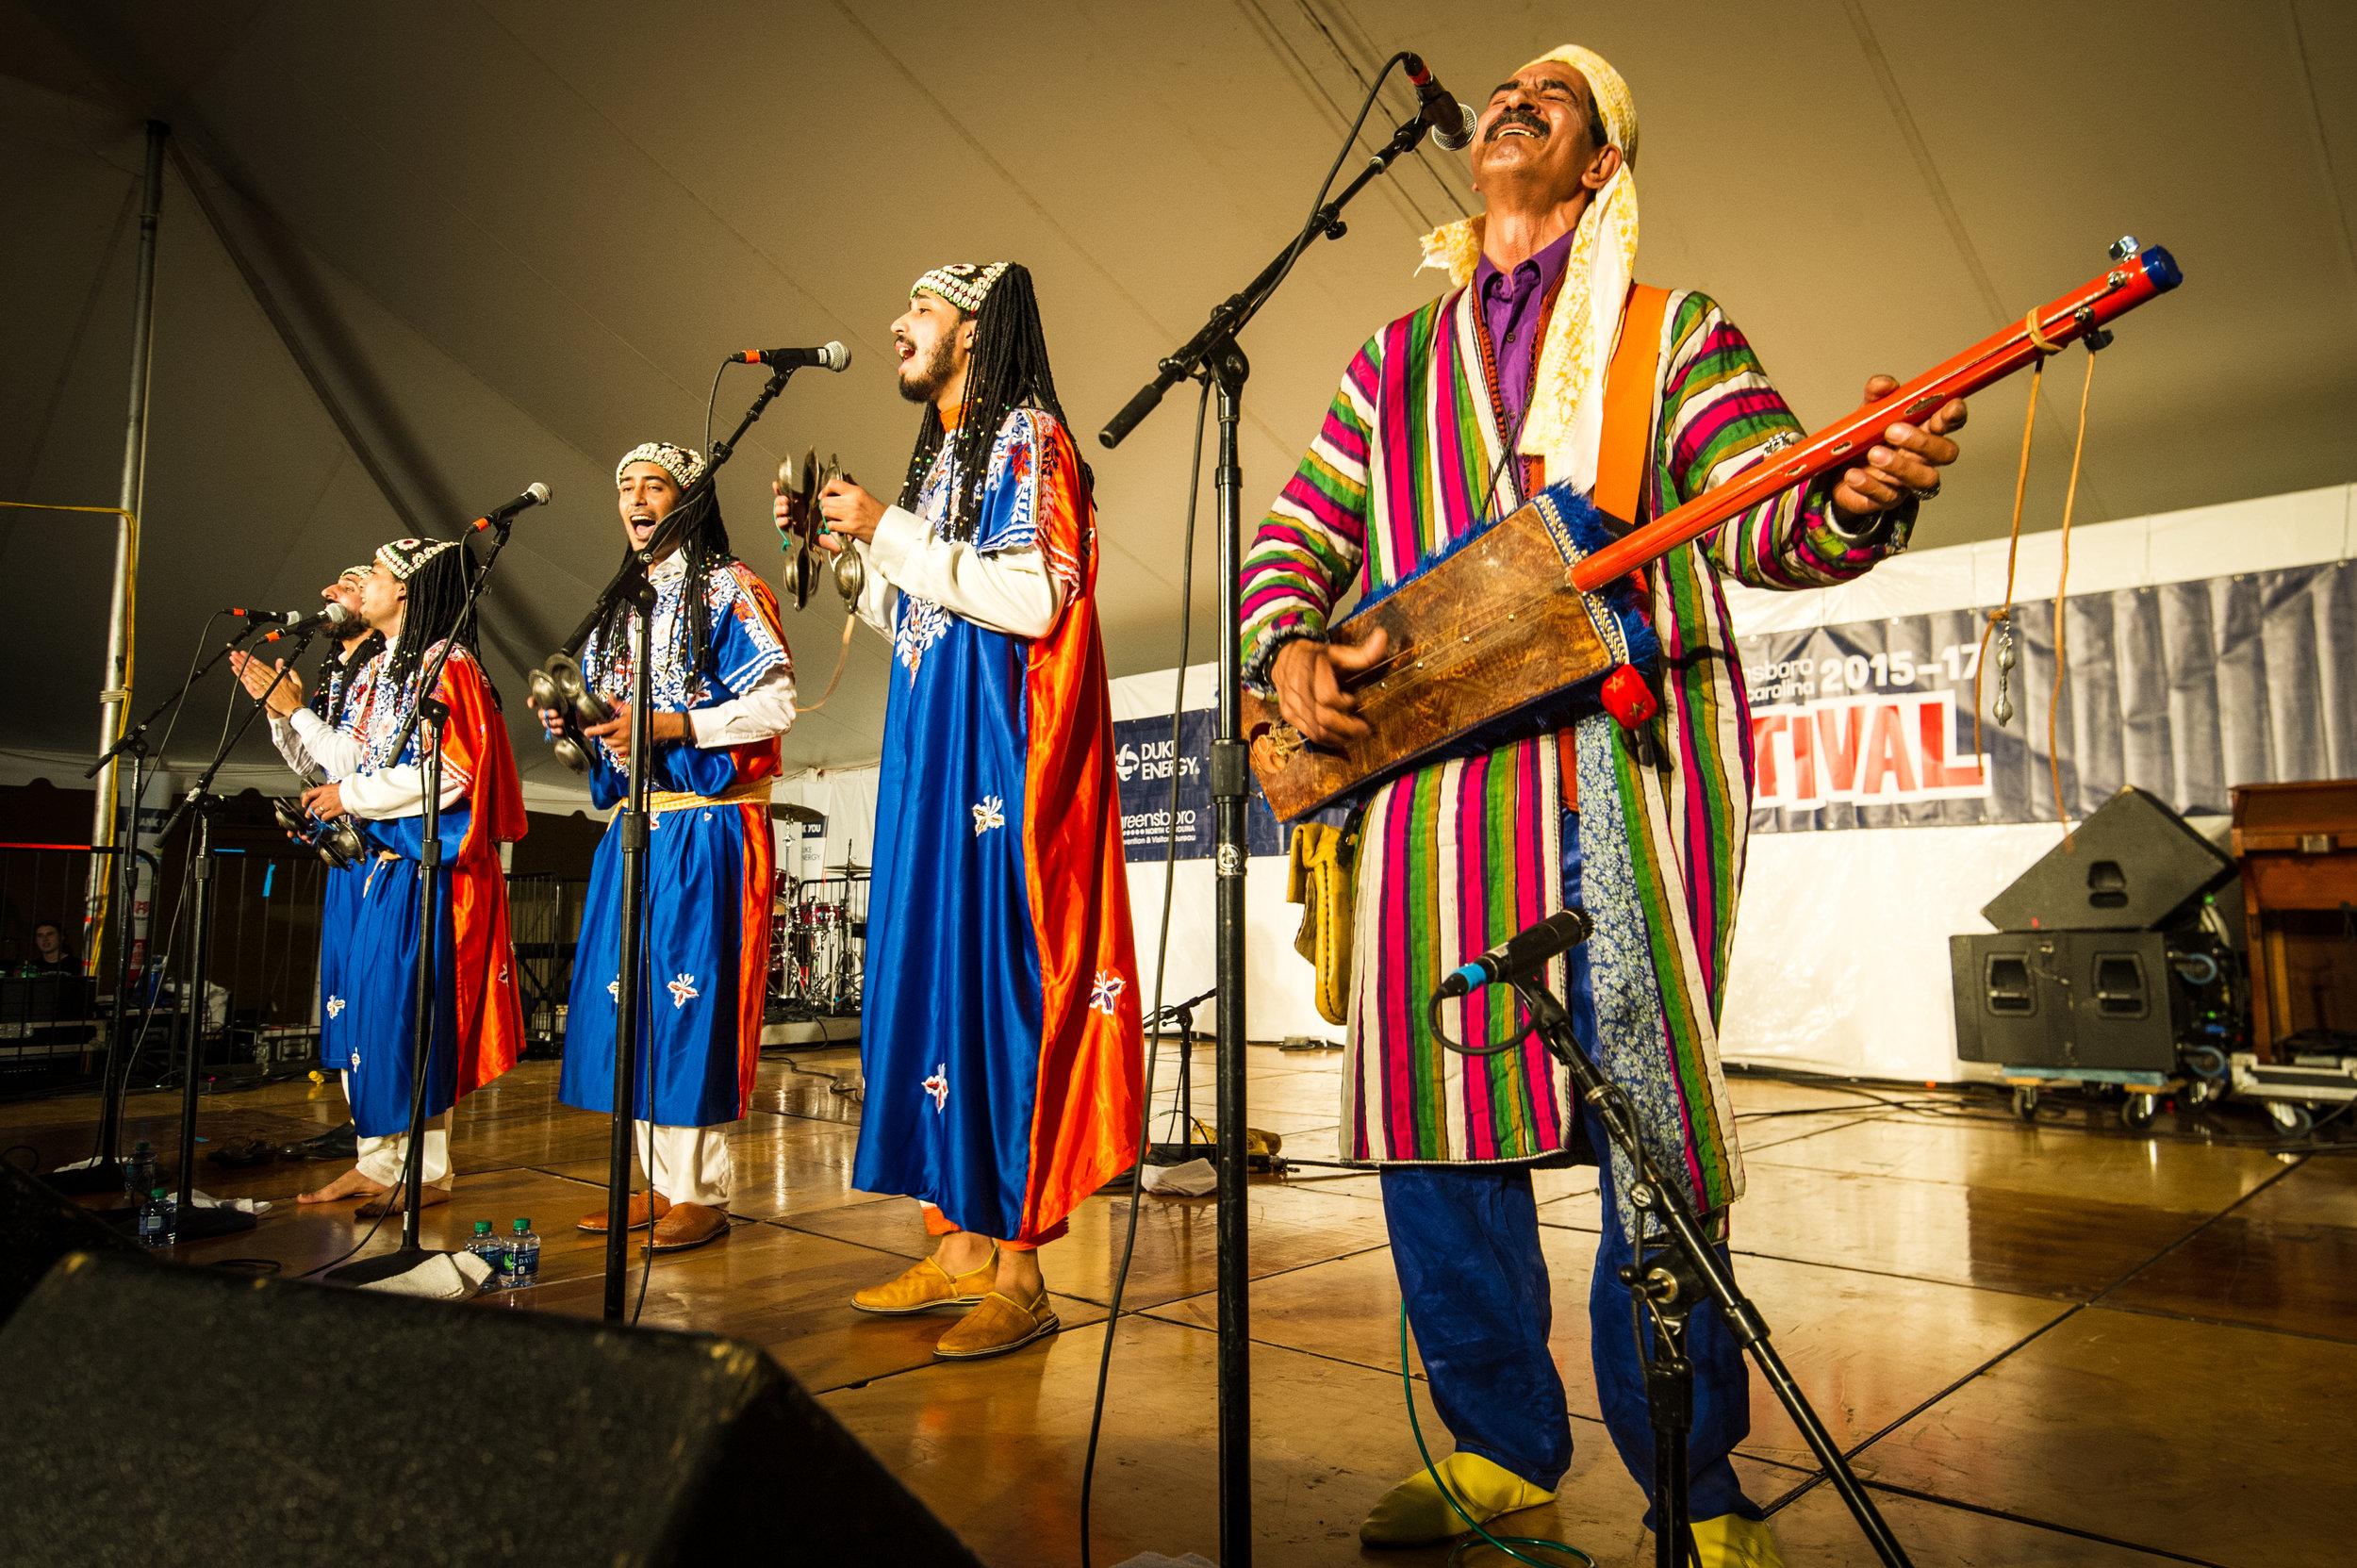 The Brooklyn, New York-based Innov Gnawa performs Moroccan trance music. Photo: Edwin Remsberg